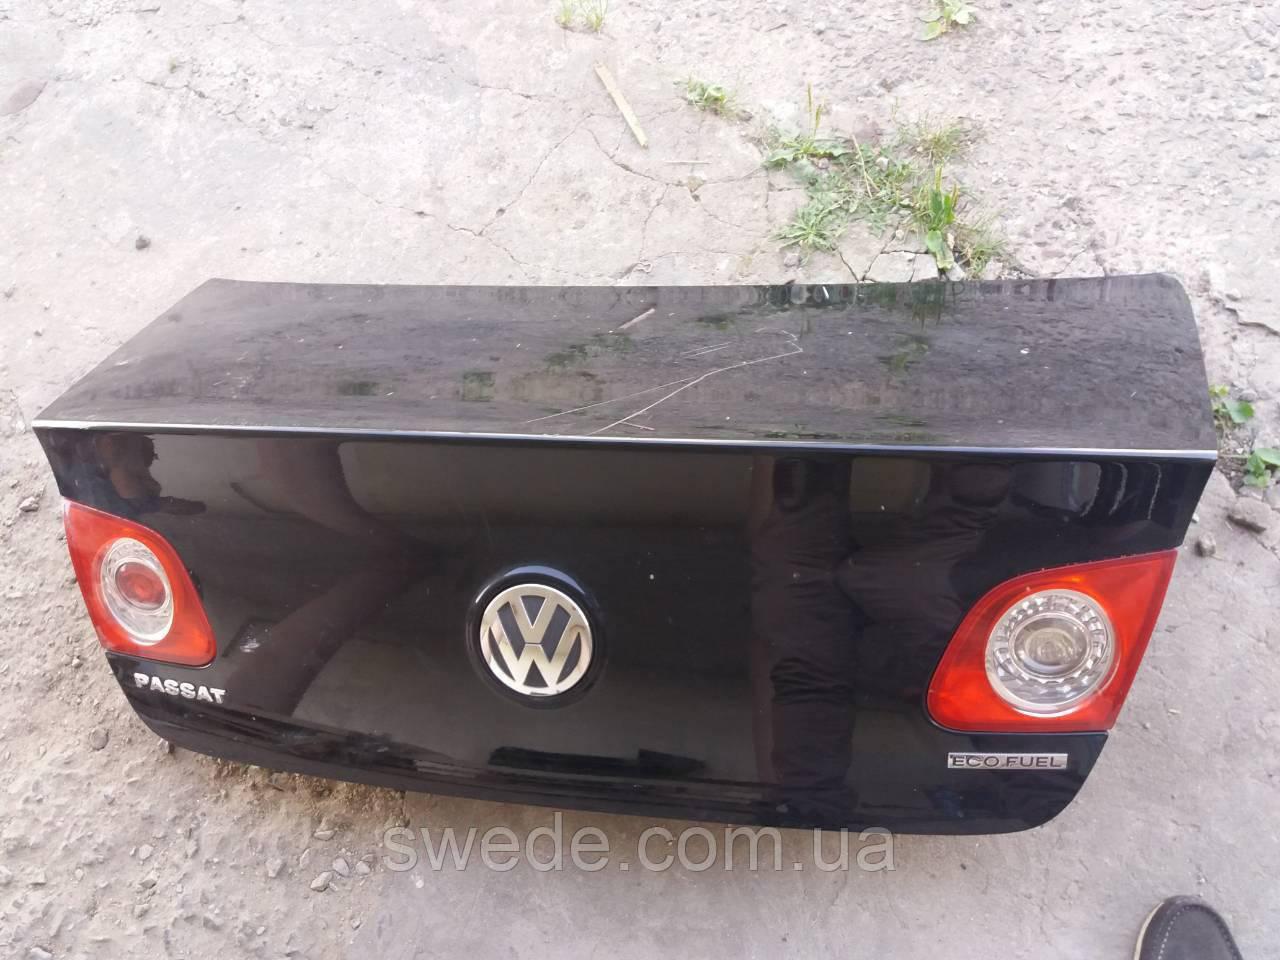 Крышка багажника Volkswagen Passat B6 2005-2010 гг 3C5827025H